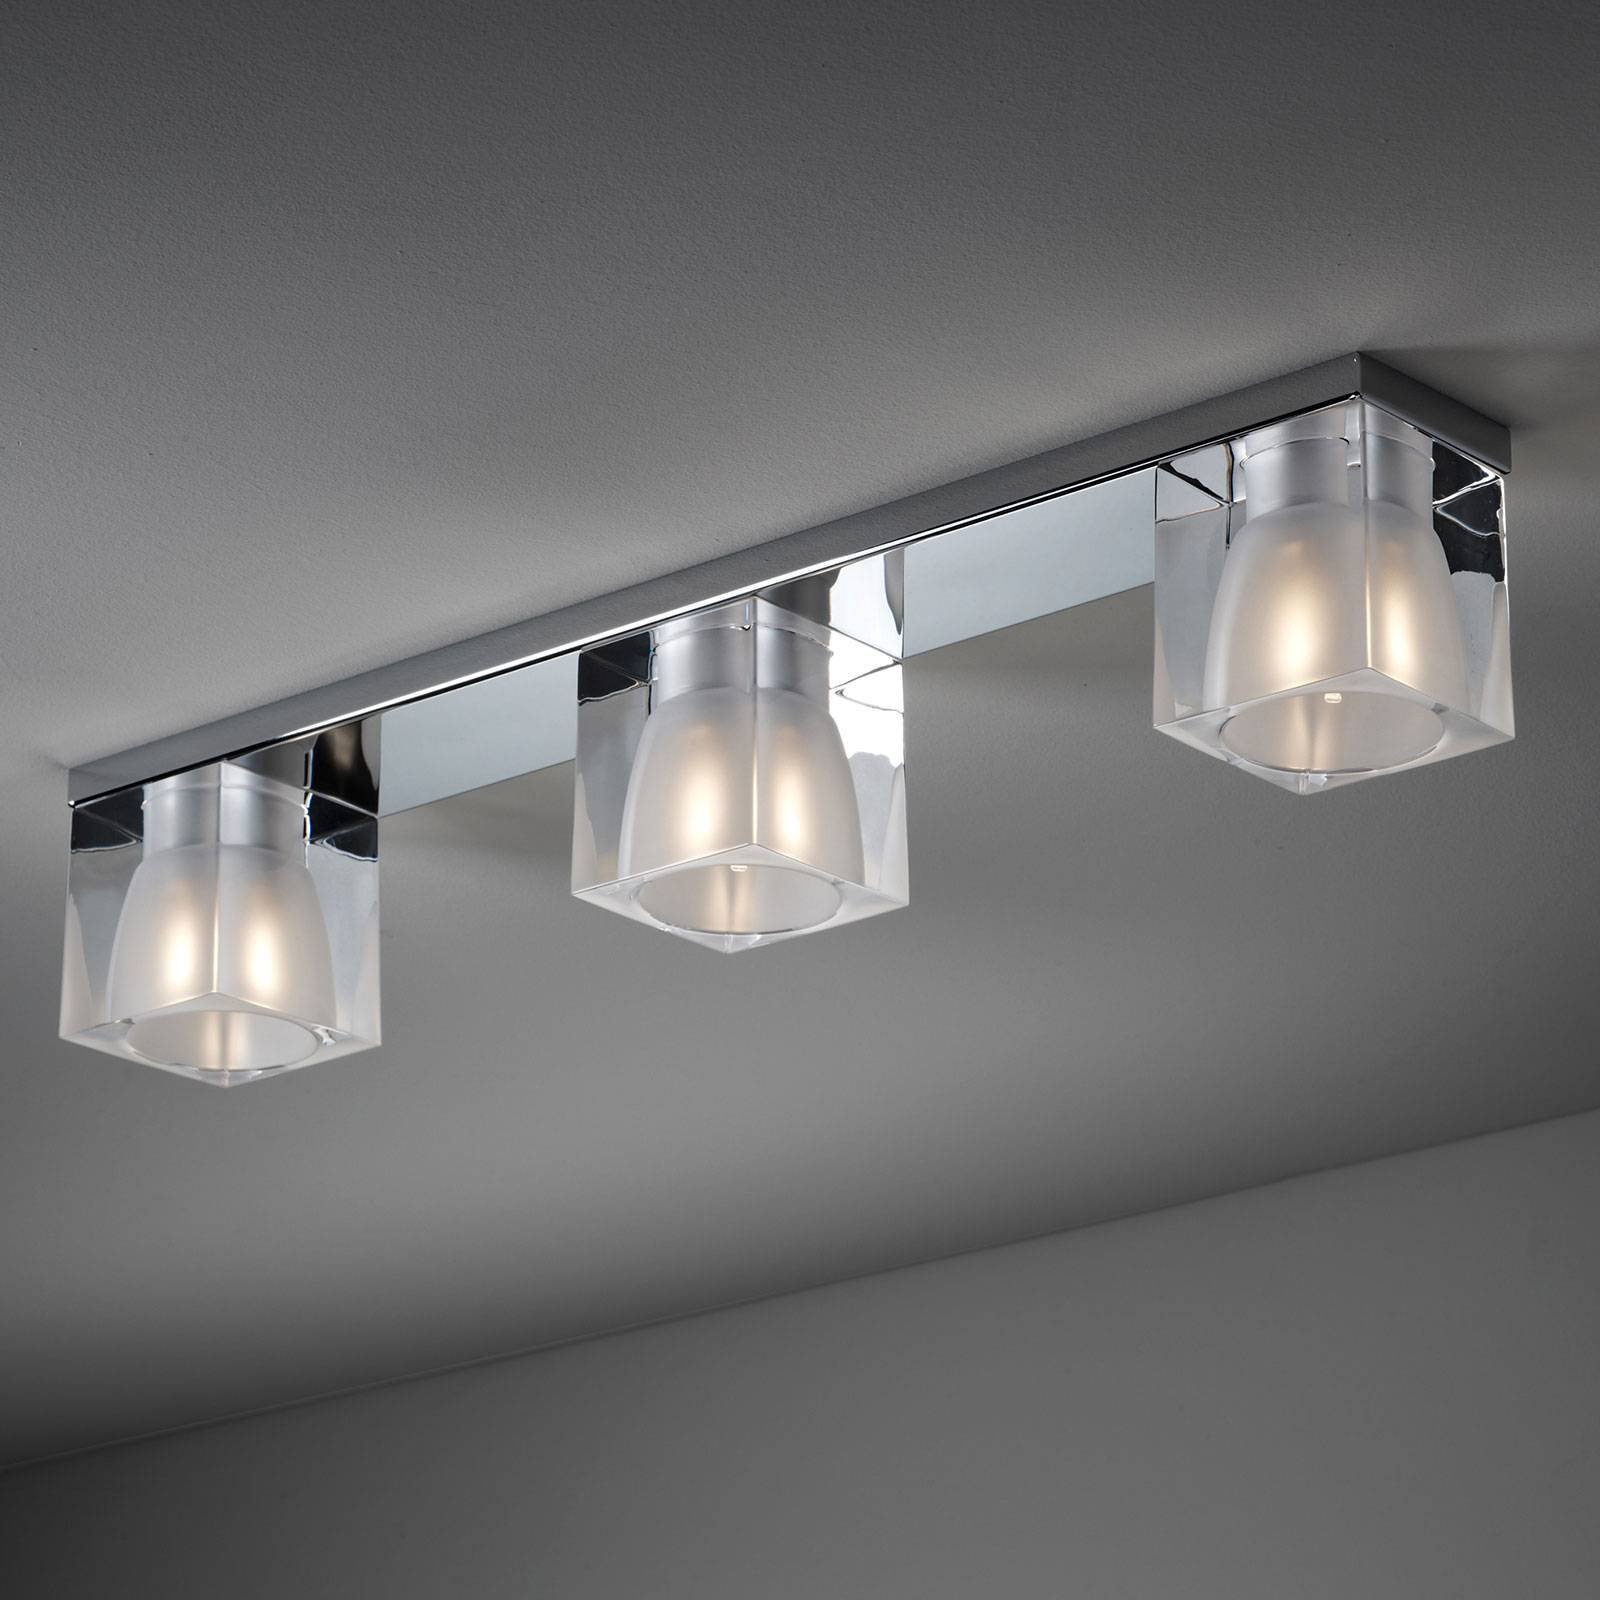 Fabbian Cubetto taklampe 3 lyskilder G9, klar